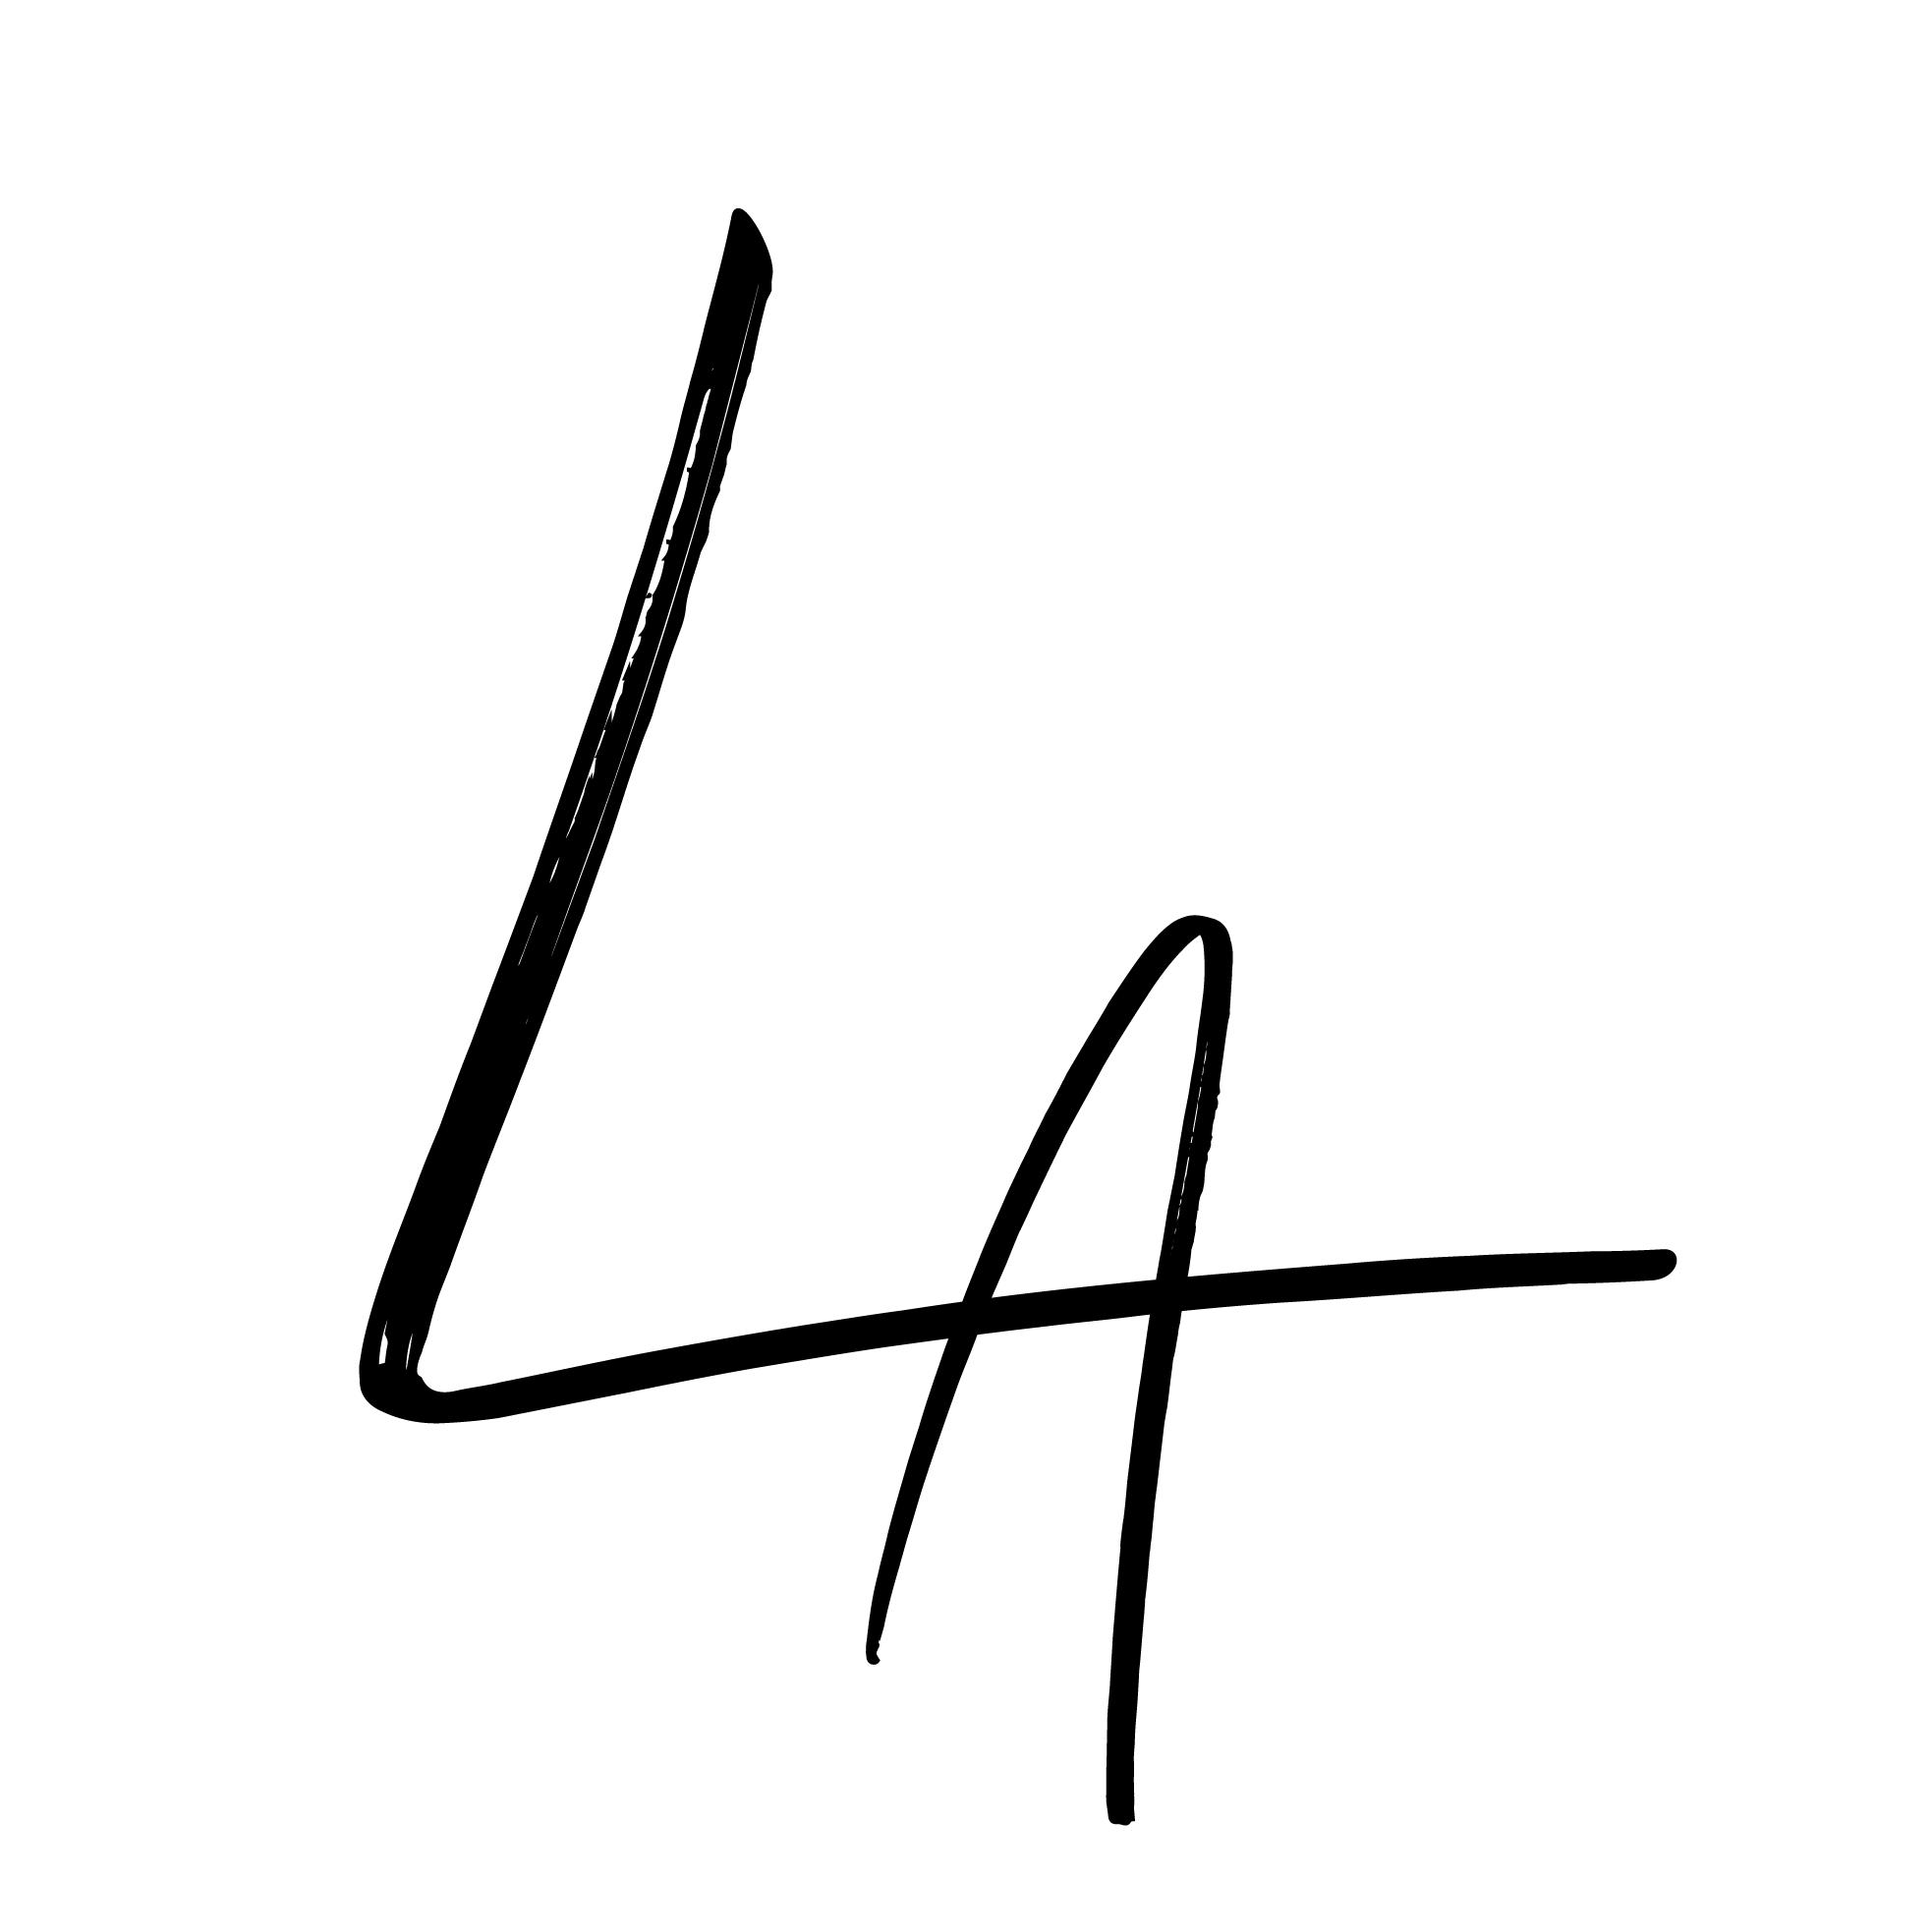 logo traiteur paris lucus augusti